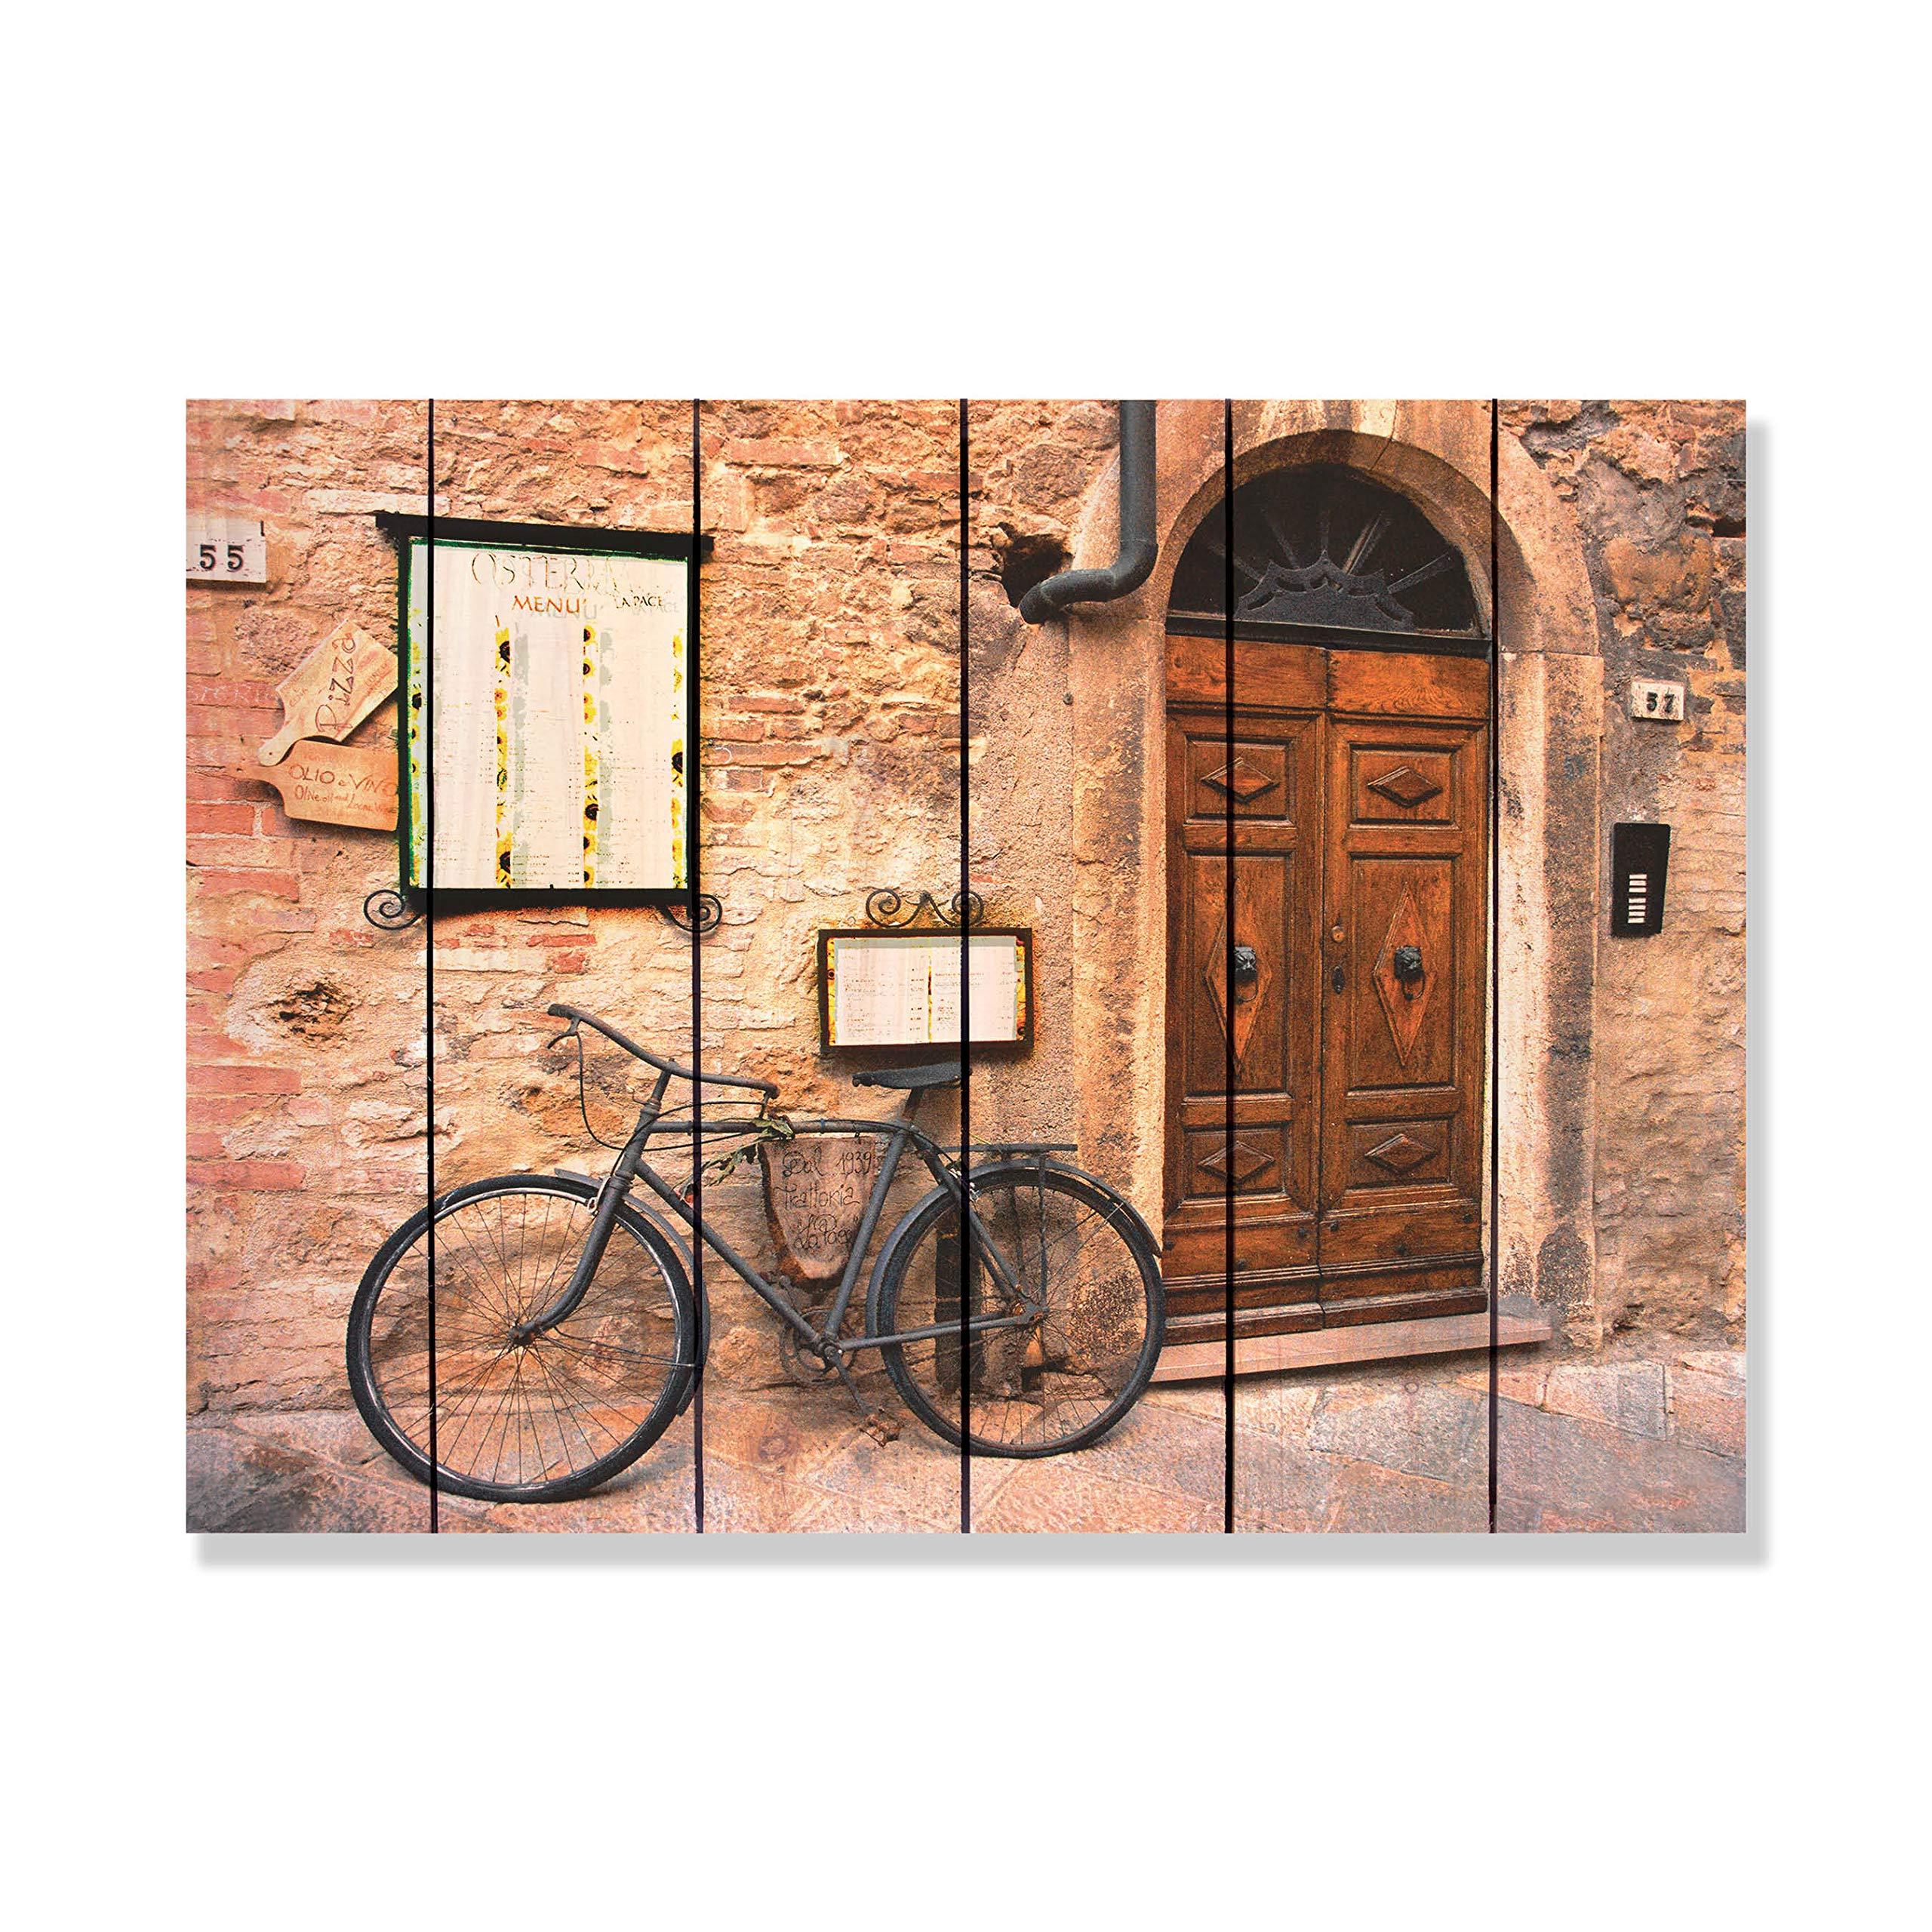 Gizaun Art Italiano Osteria 33-Inch by 24-Inch Inside/Outside Wall Art, Full Color on Cedar